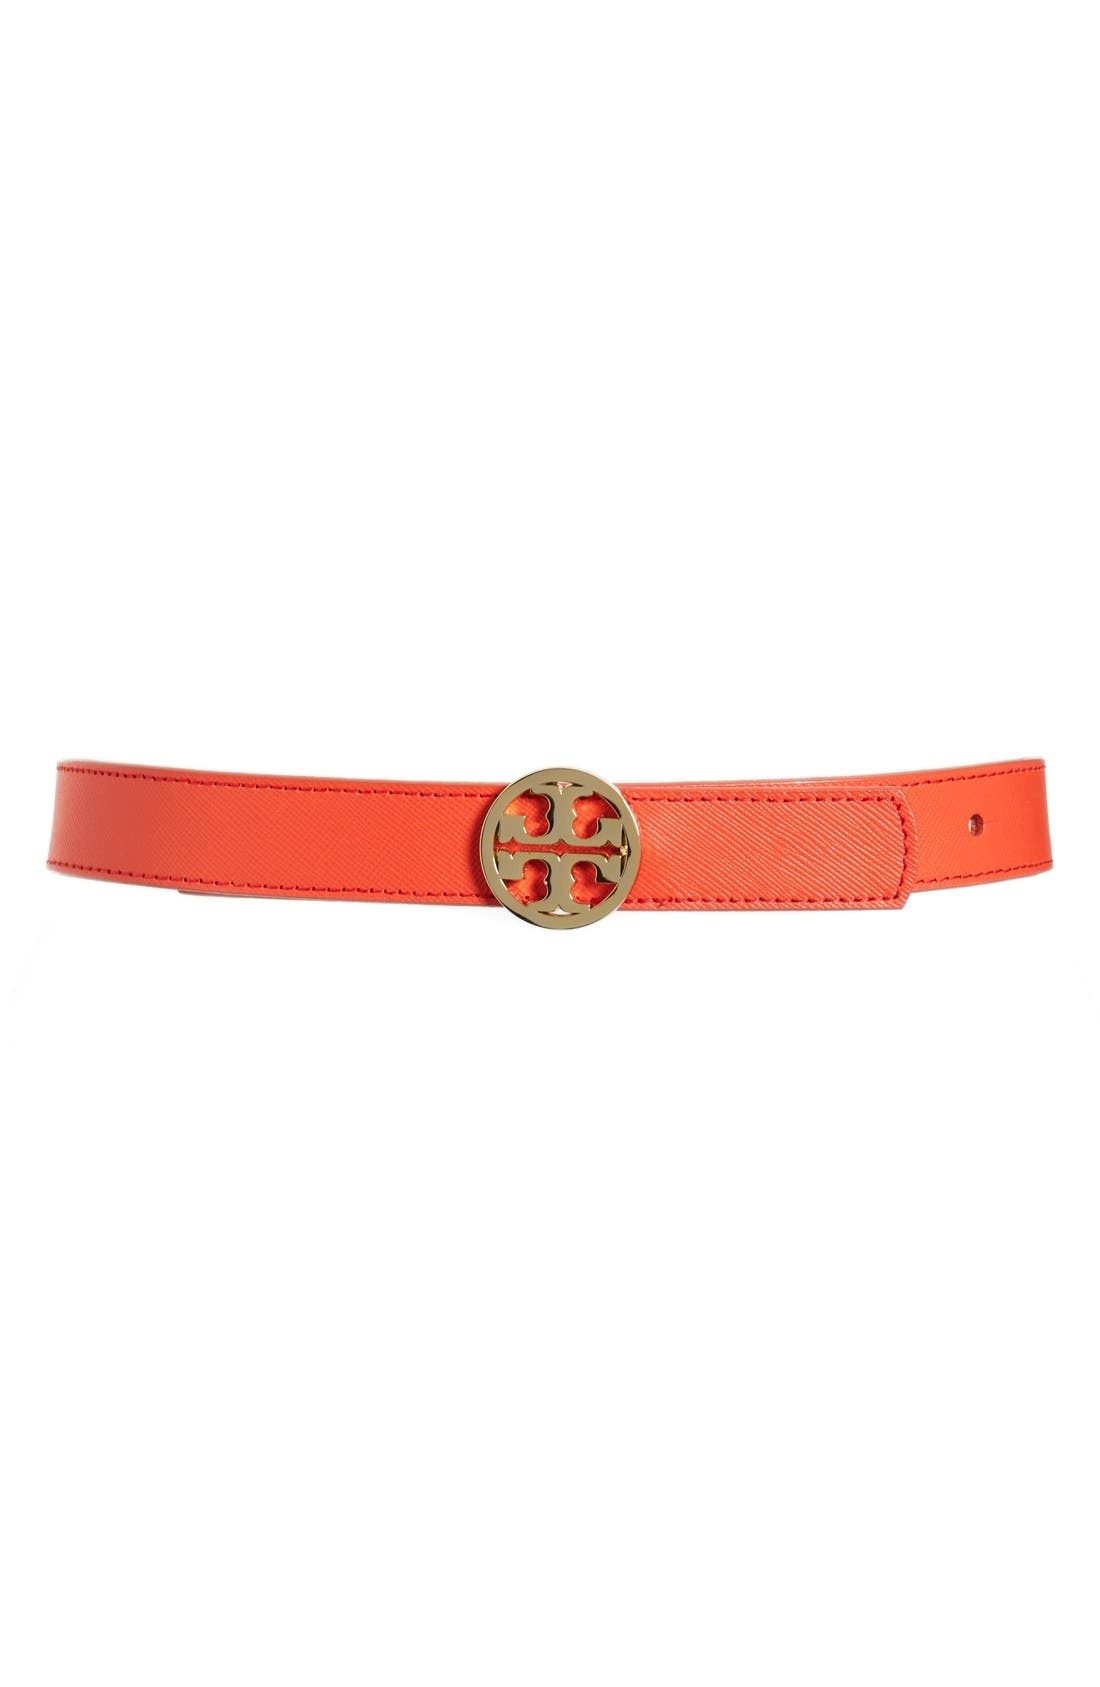 Main Image - Tory Burch 'Classic' Logo Reversible Saffiano Leather Belt